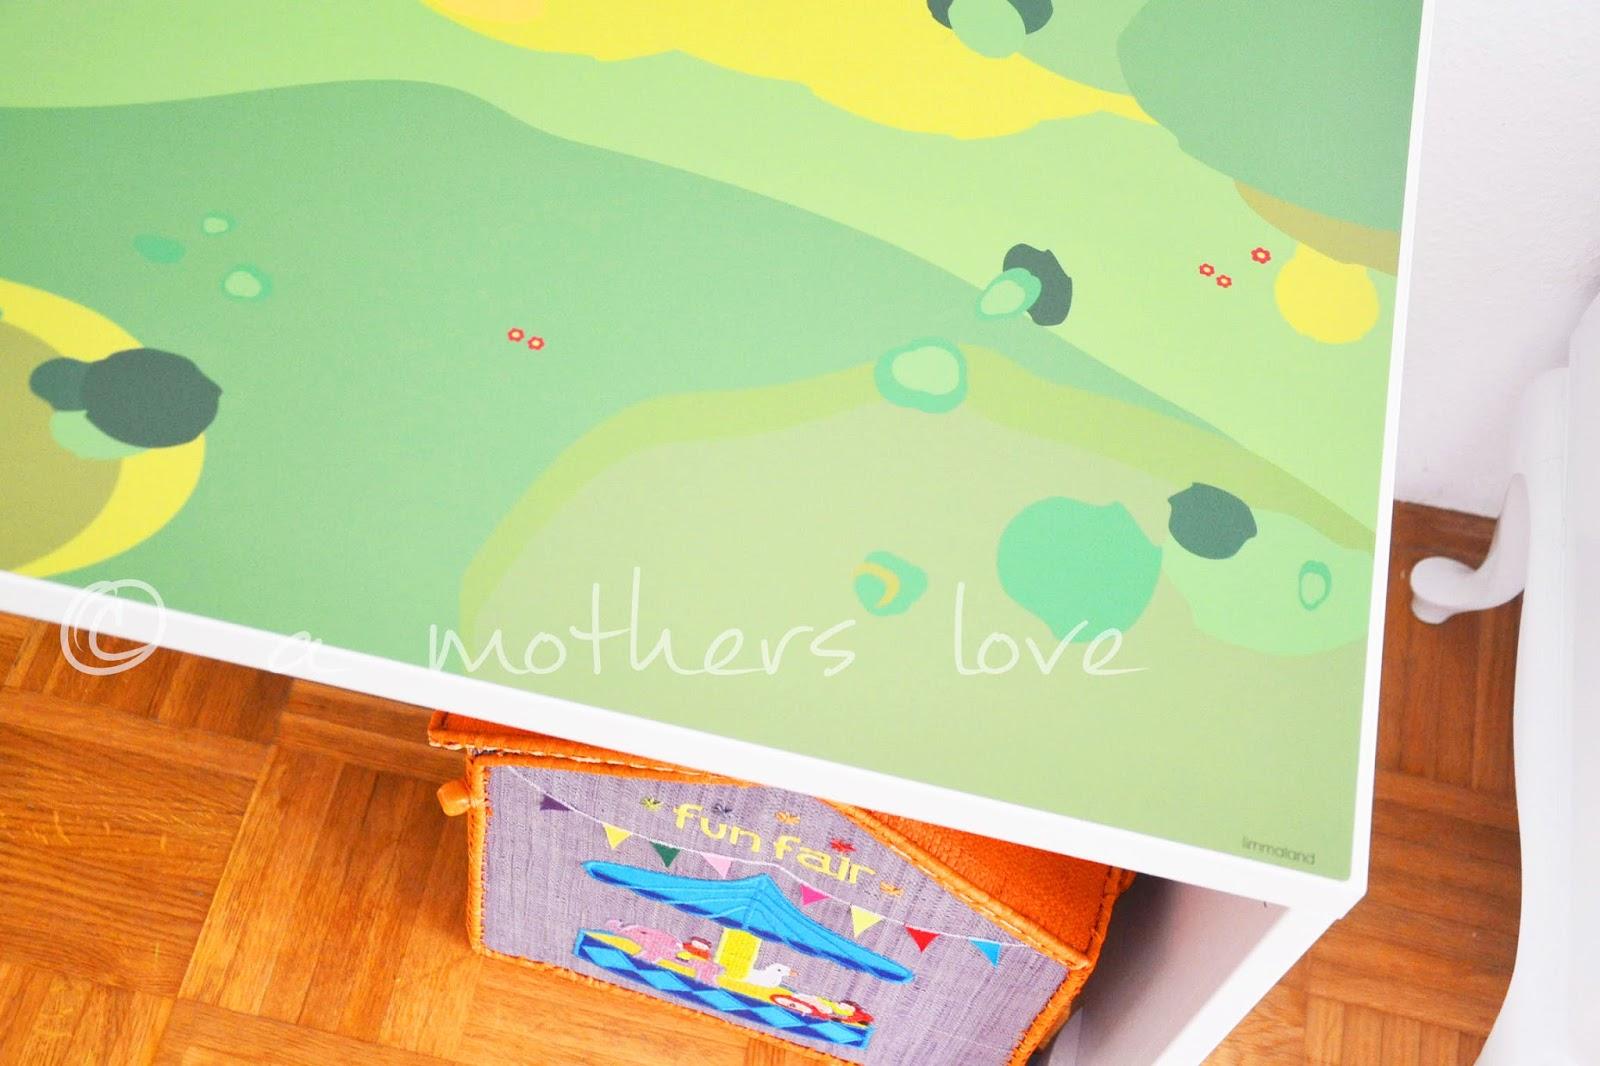 Pimp deine ikea m bel verlosung a mother 39 s love - Ikea puppenhaus mobel ...